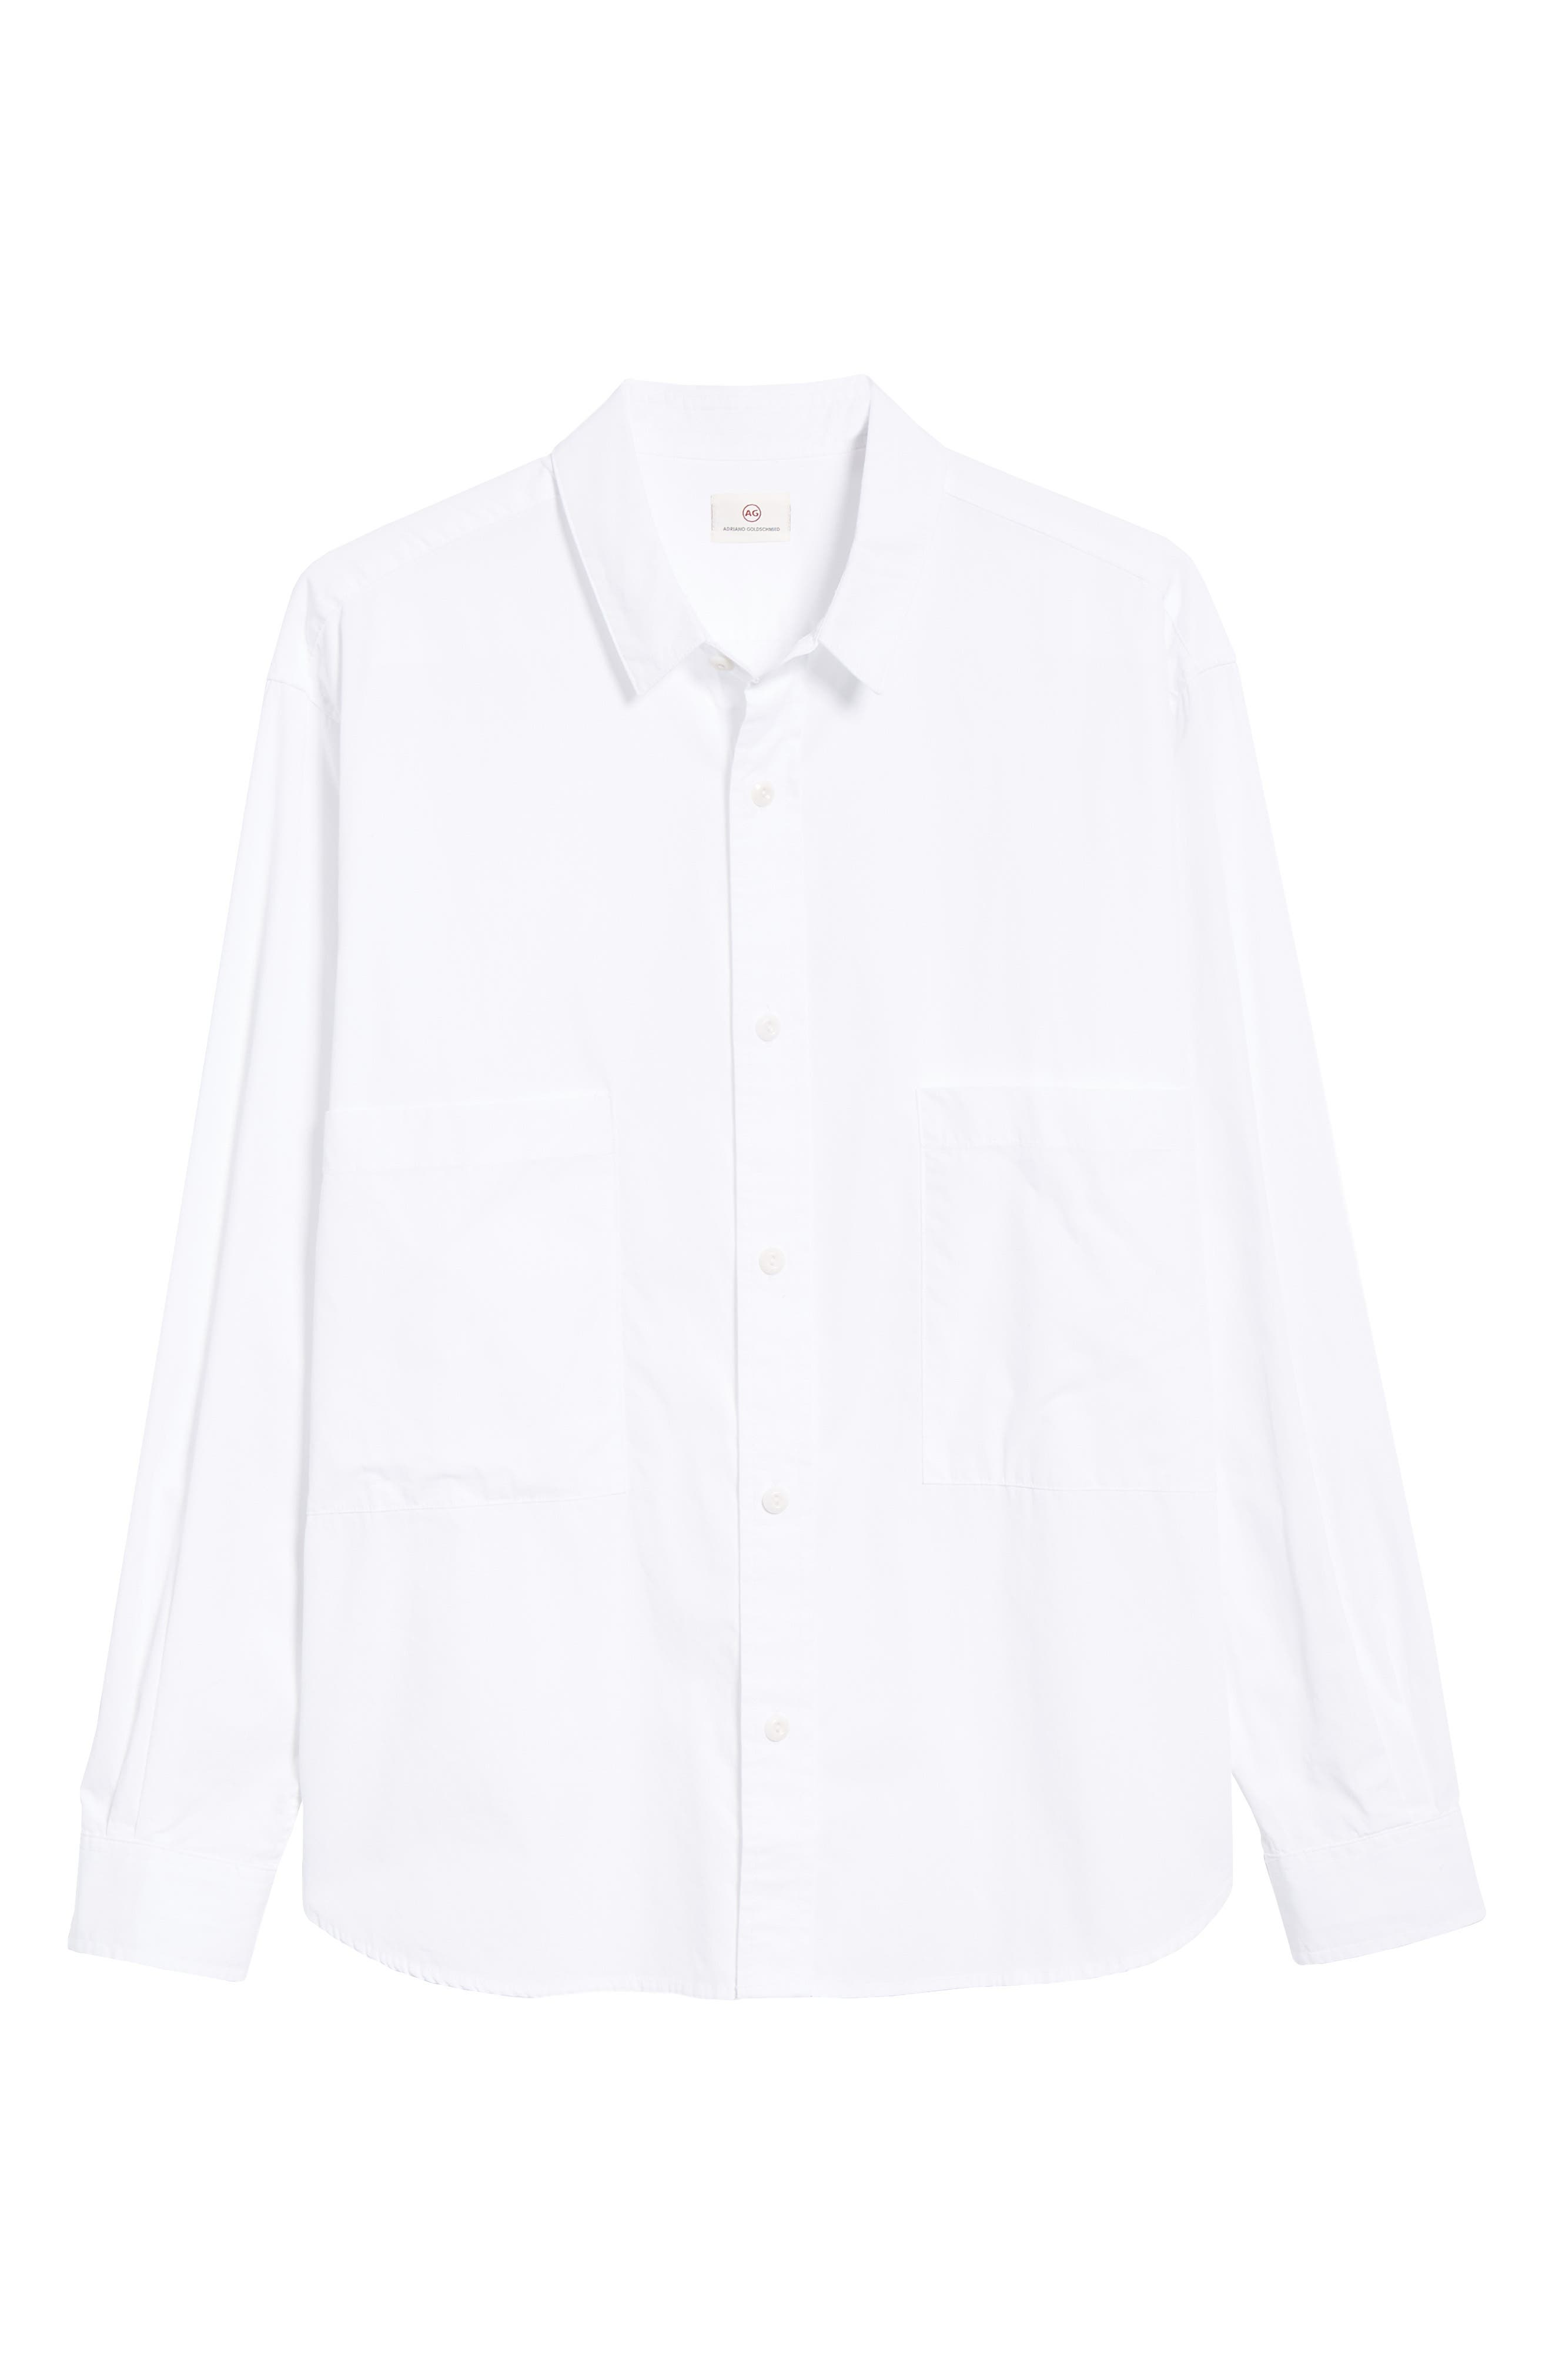 Shiro Oversize Pockets Regular Fit Sport Shirt,                             Alternate thumbnail 5, color,                             TRUE WHITE